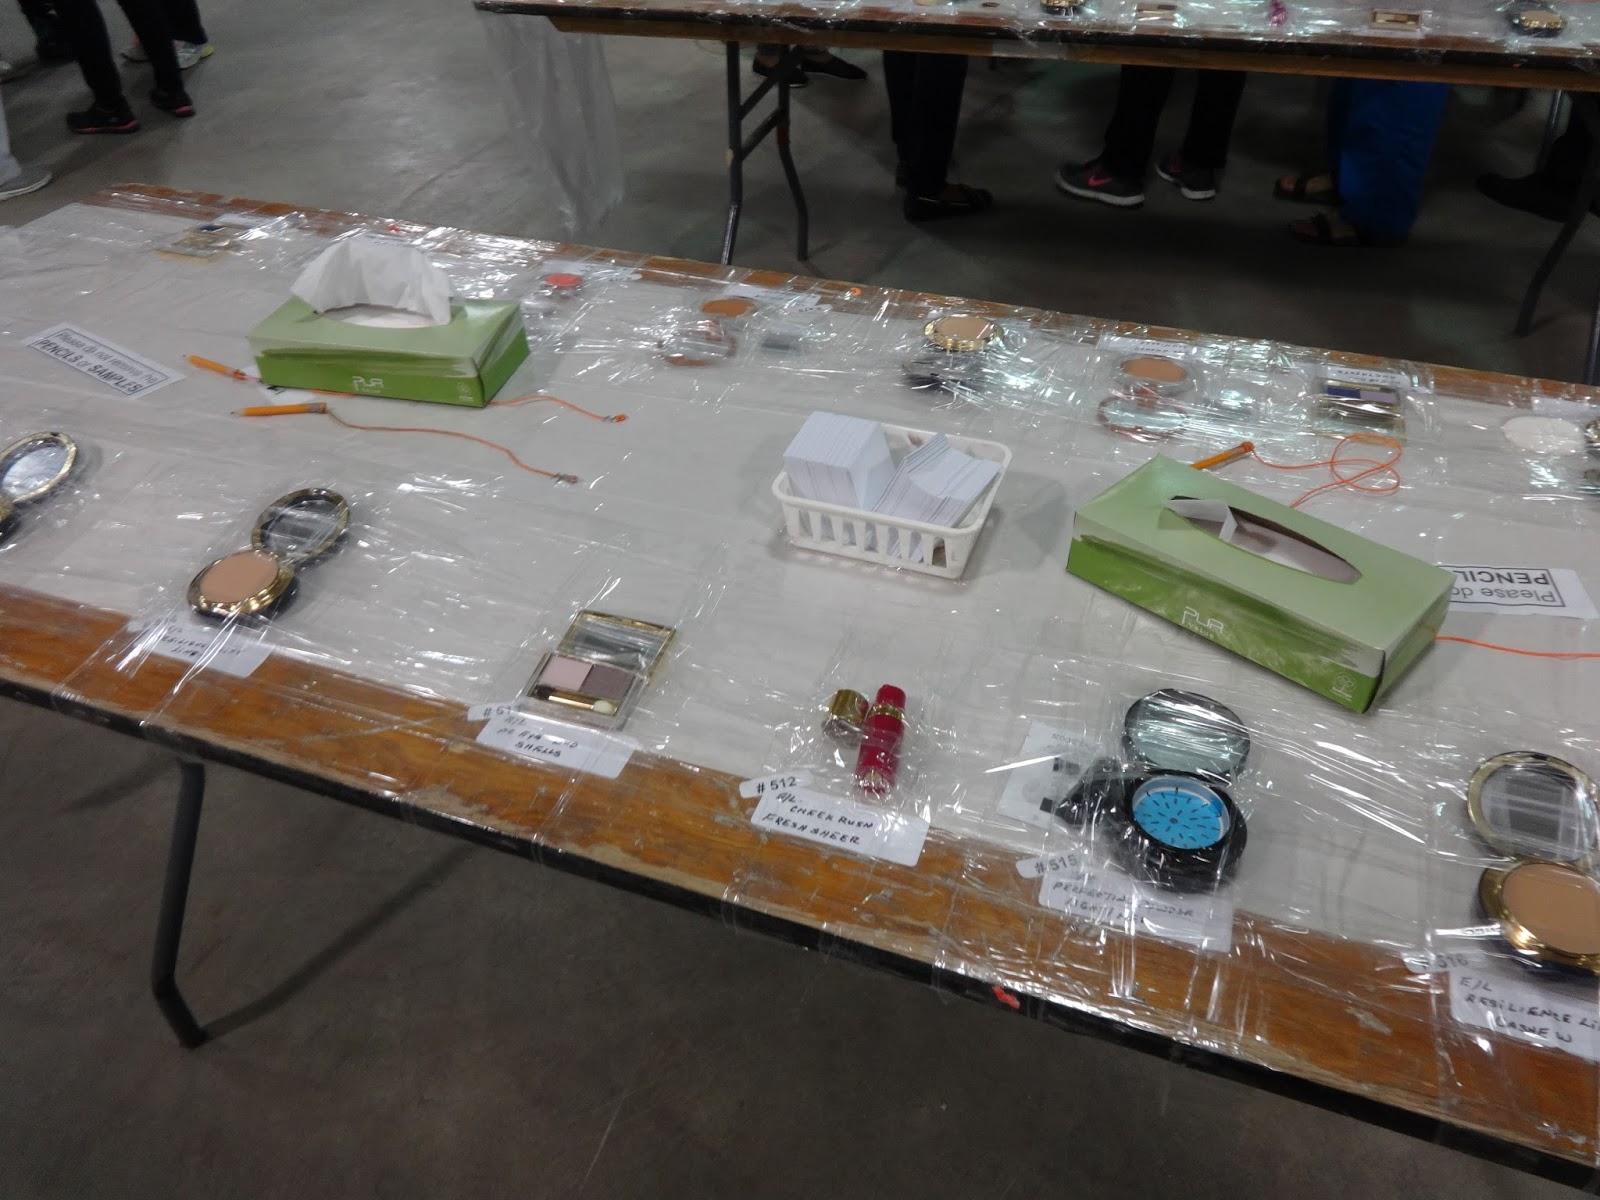 MAC Estee Lauder Warehouse Sale haul